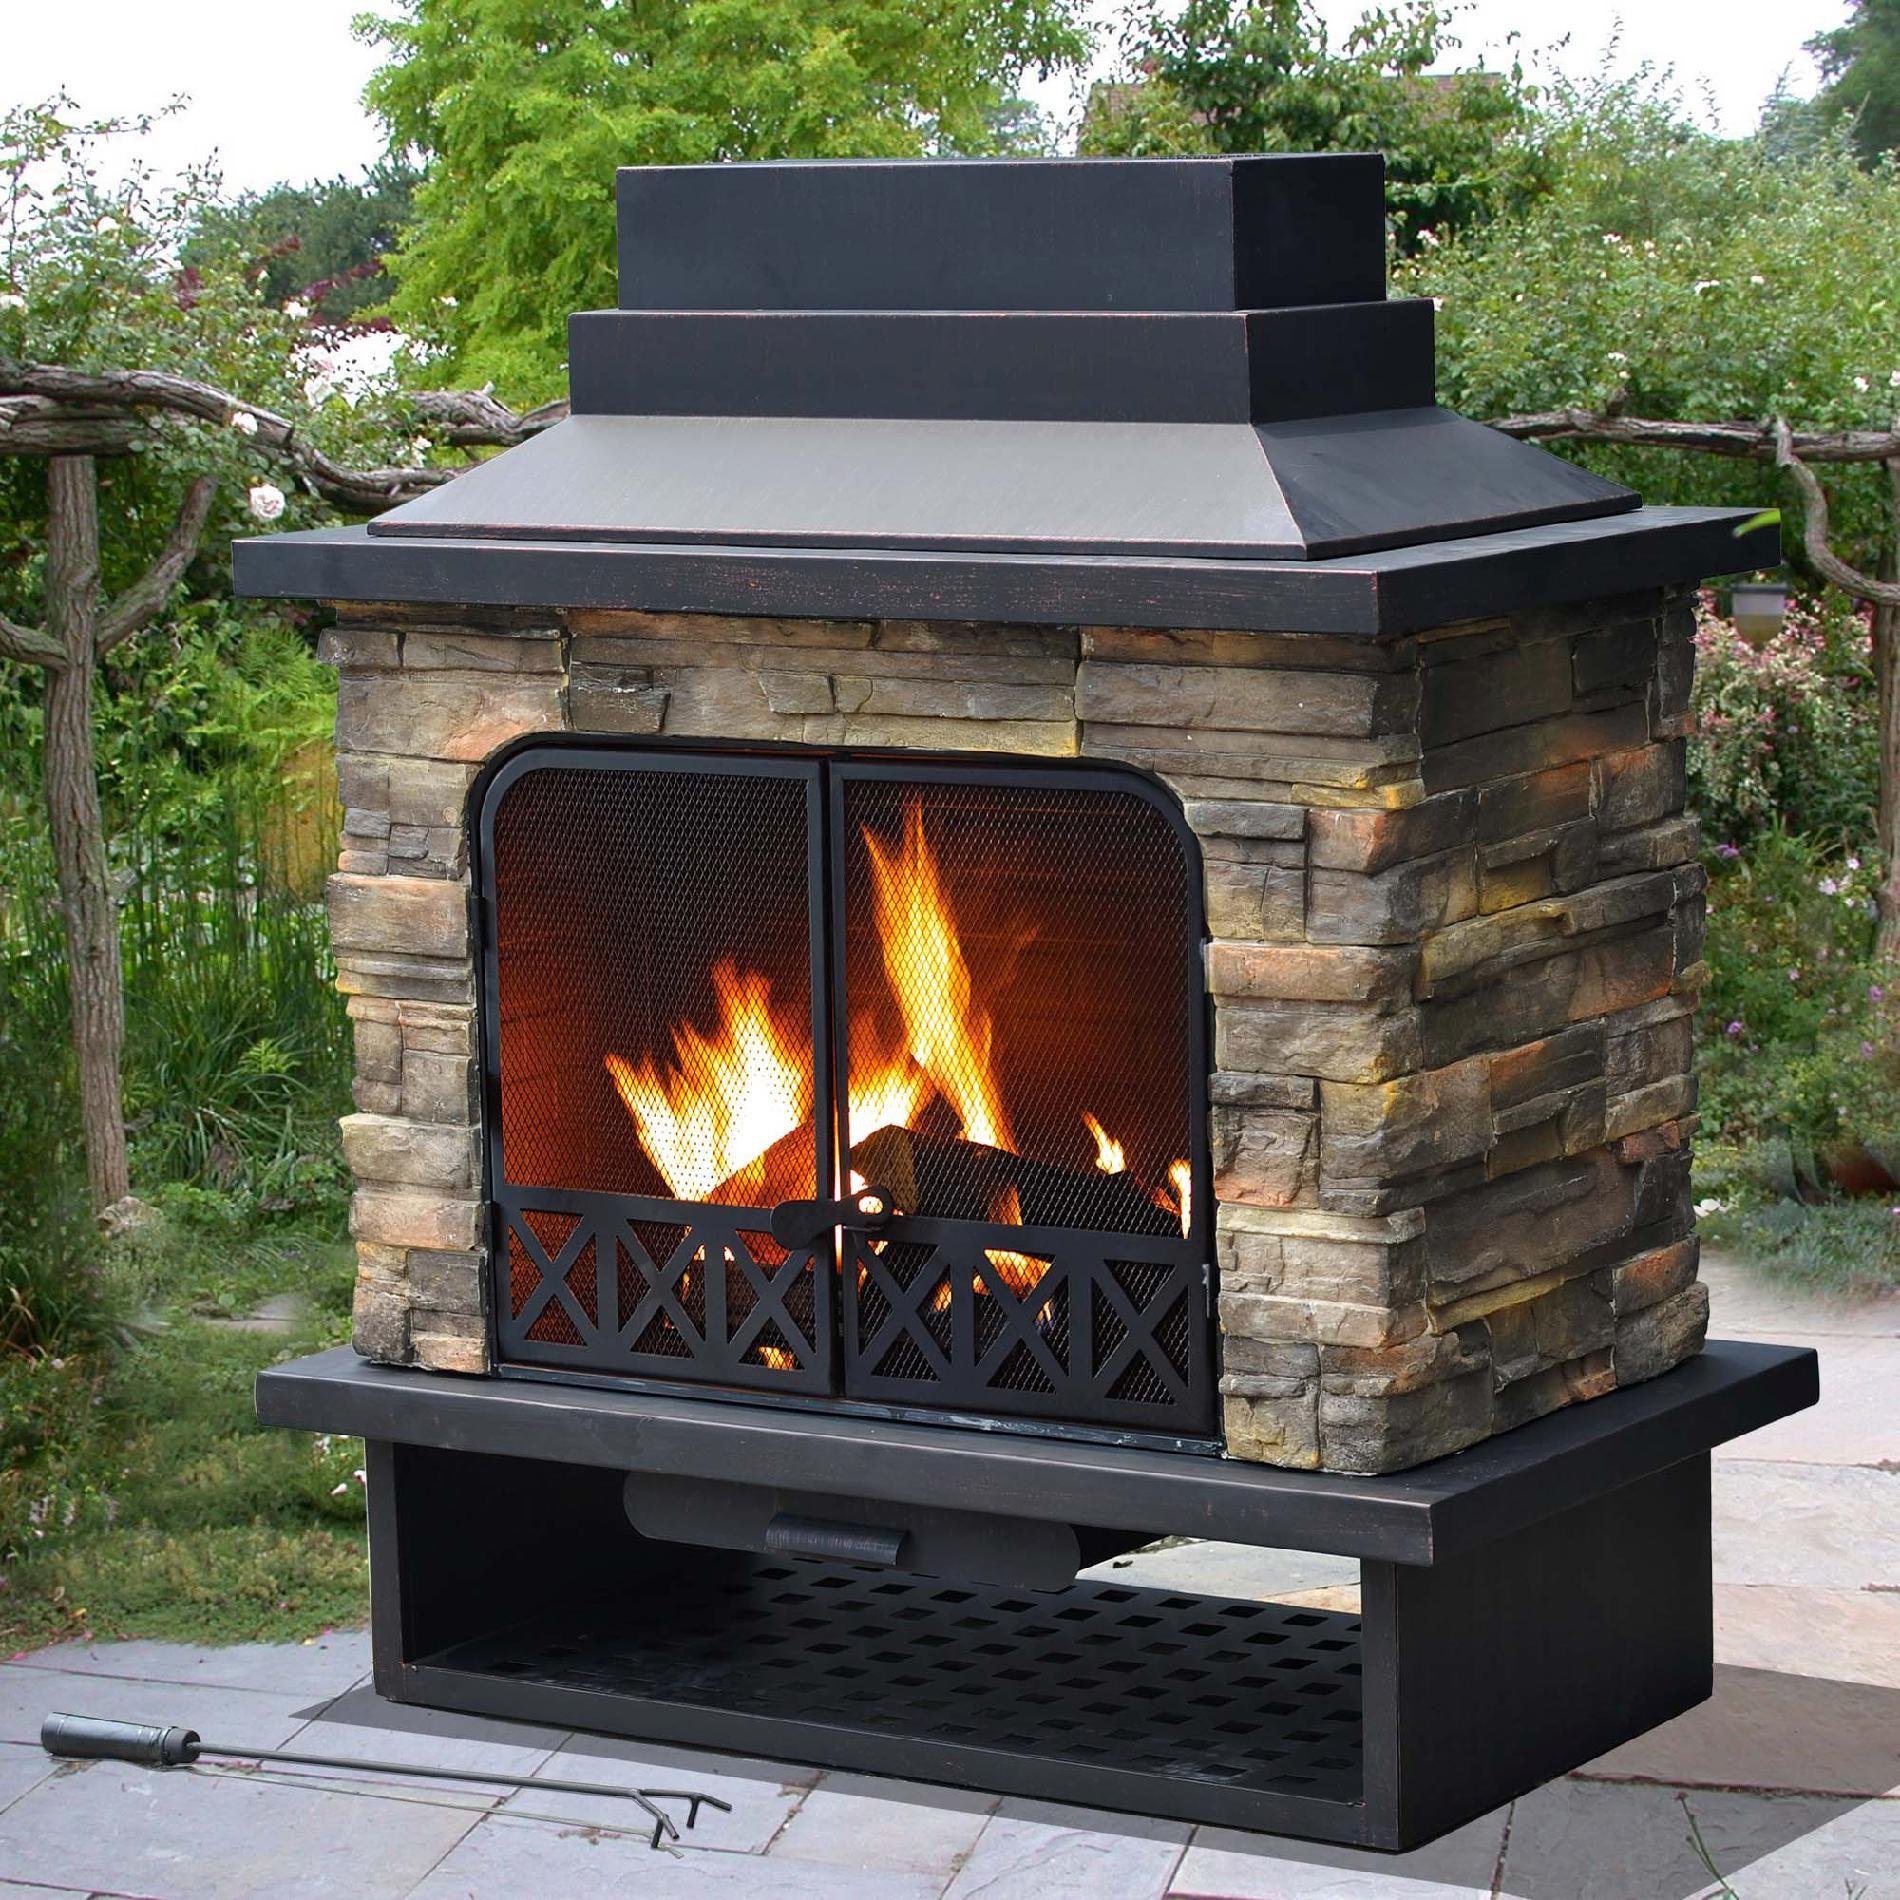 Sunjoy Sutton Fire Place Black Outdoor Wood Burning Fireplace Backyard Fireplace Outdoor Fireplace